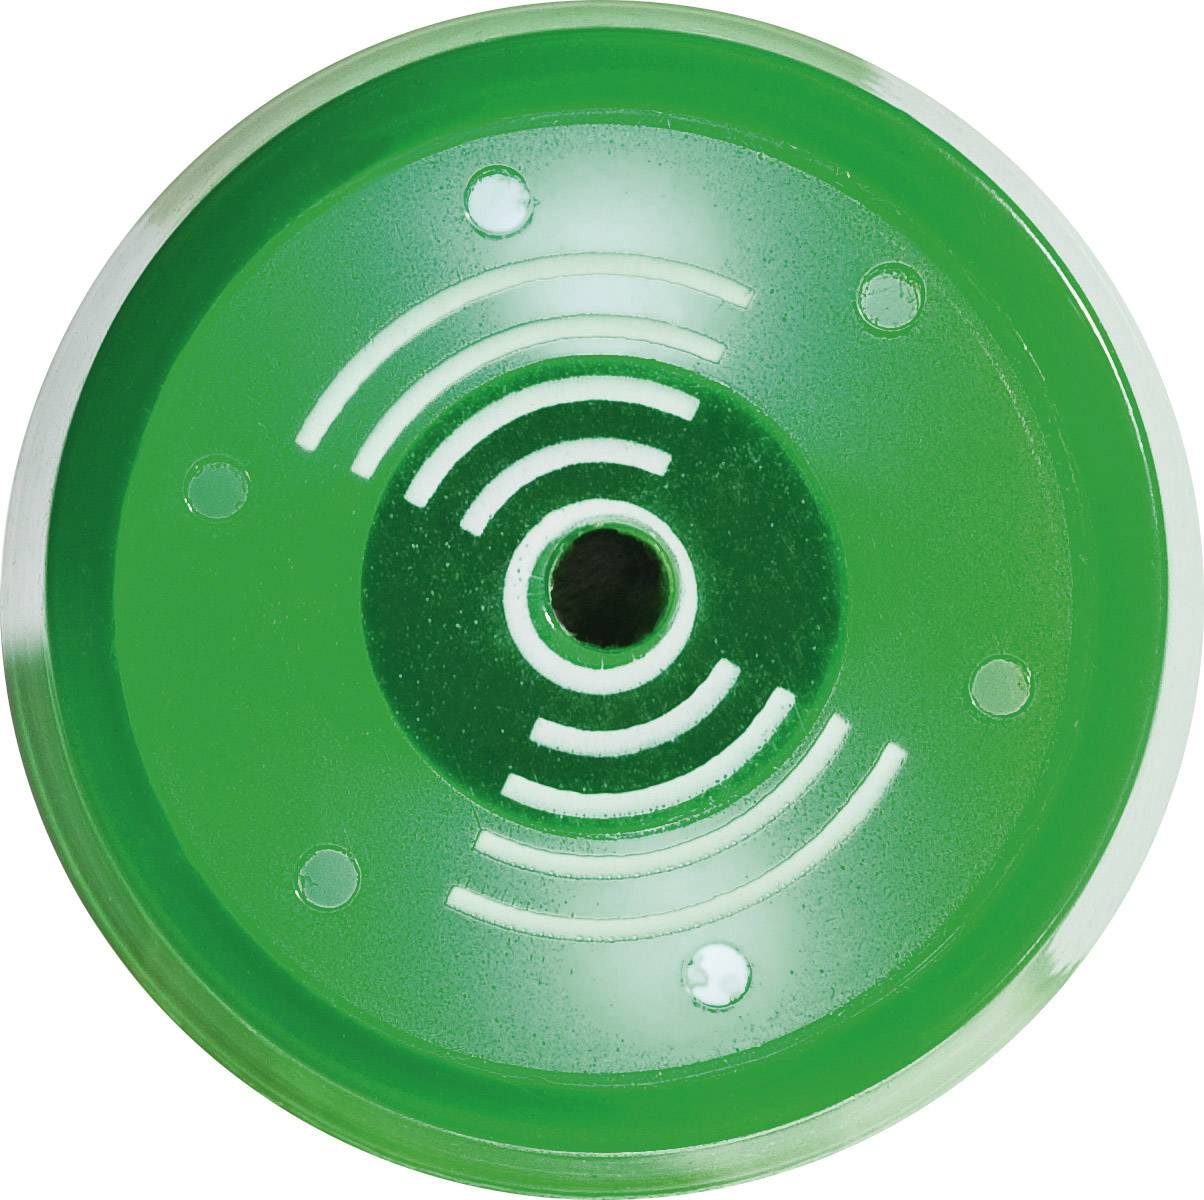 Sirénka / kontrolka, 80 dB 12 V / DC, zelená